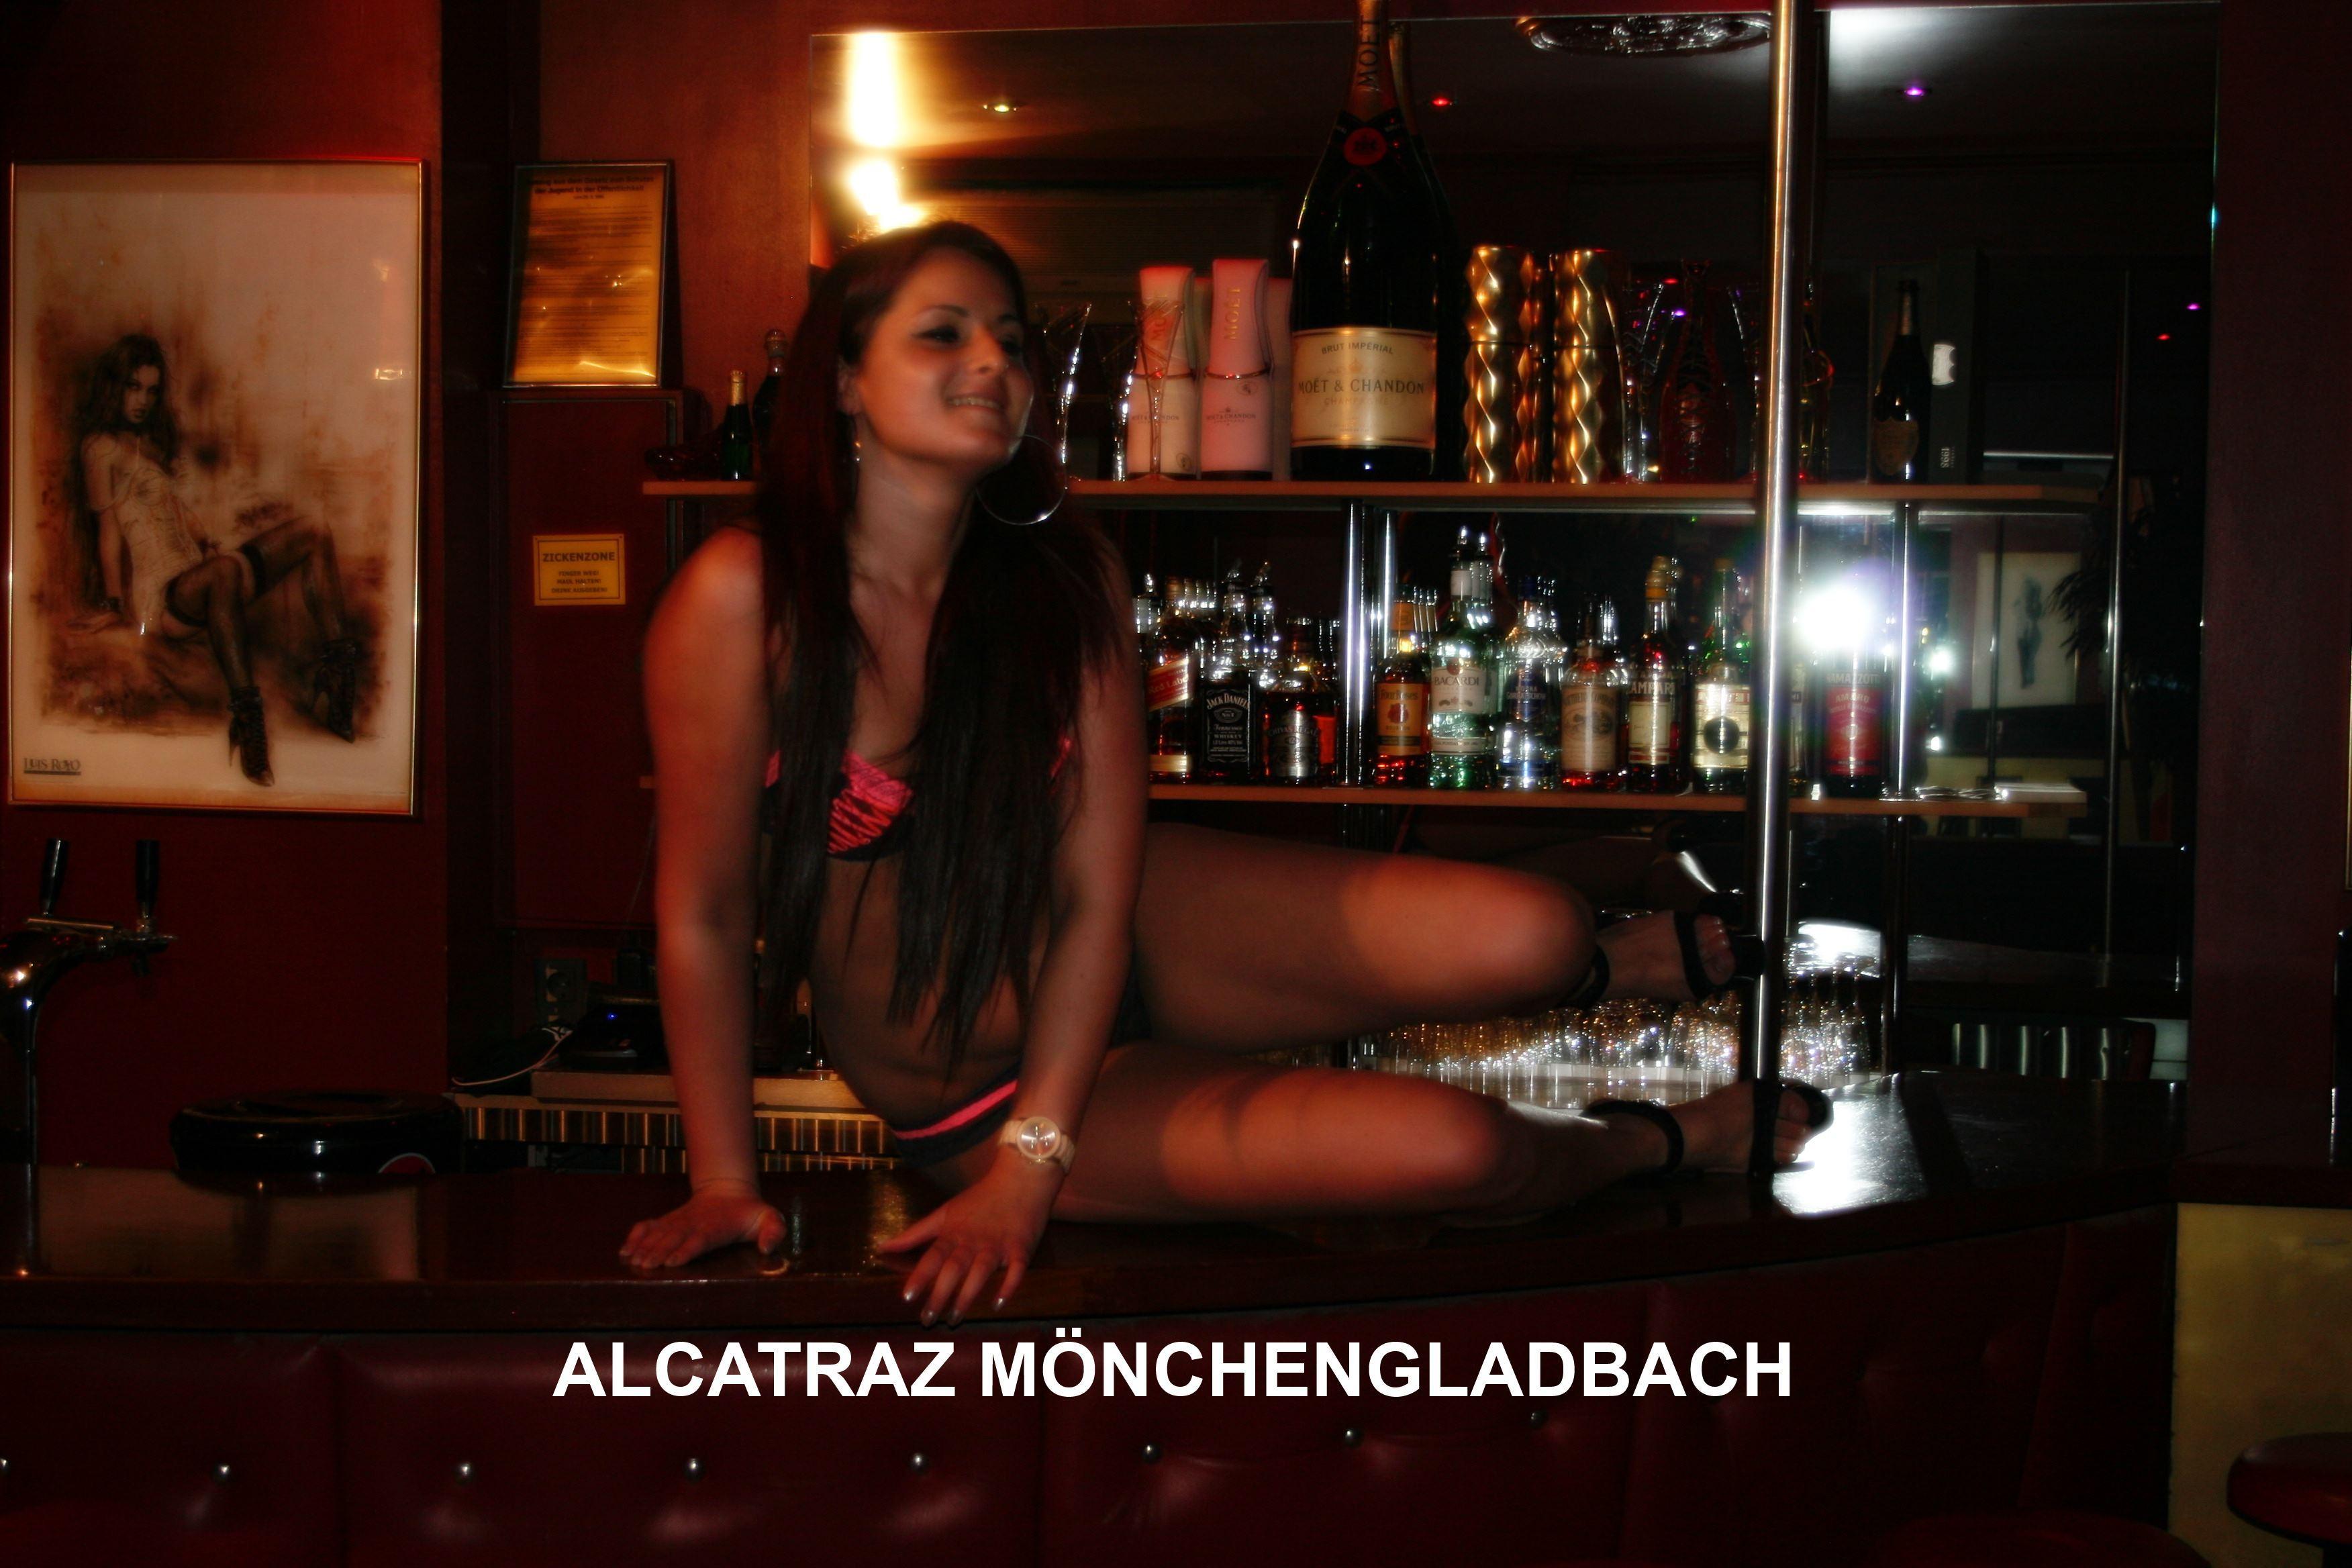 swingerclub nordhessen erotik ruhrgebiet